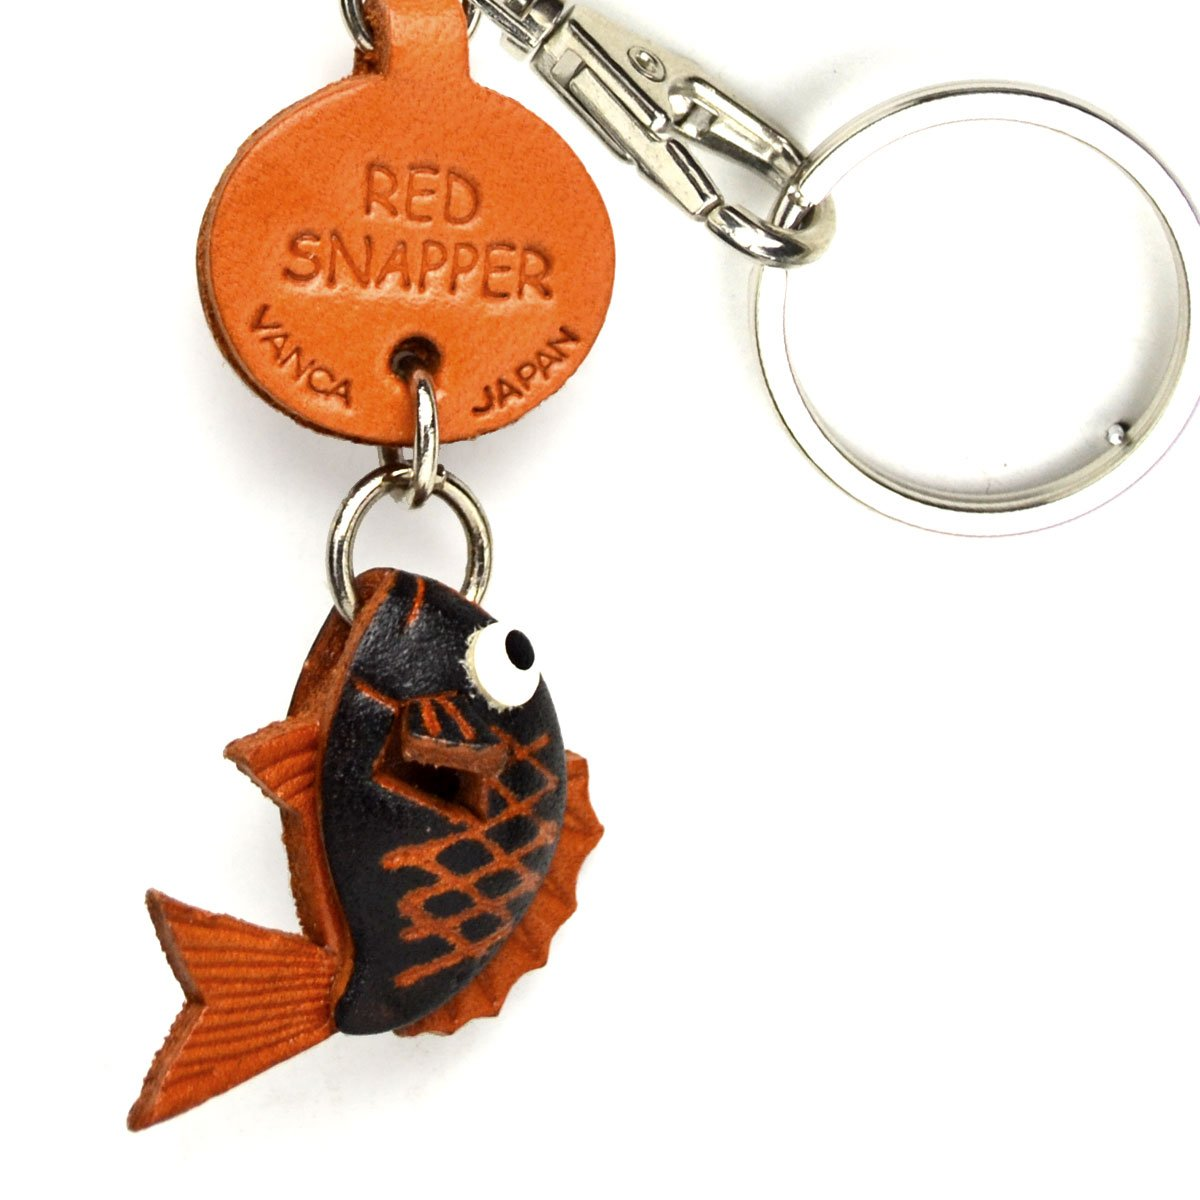 Red Snapperレザー魚/ SeaAnimal SeaAnimal Small Small Keychains VANCA VANCA craft-collectibleキーリング日本製 B008DPWFNE, BBR-baby 1号店:6b136c80 --- awardsame.club